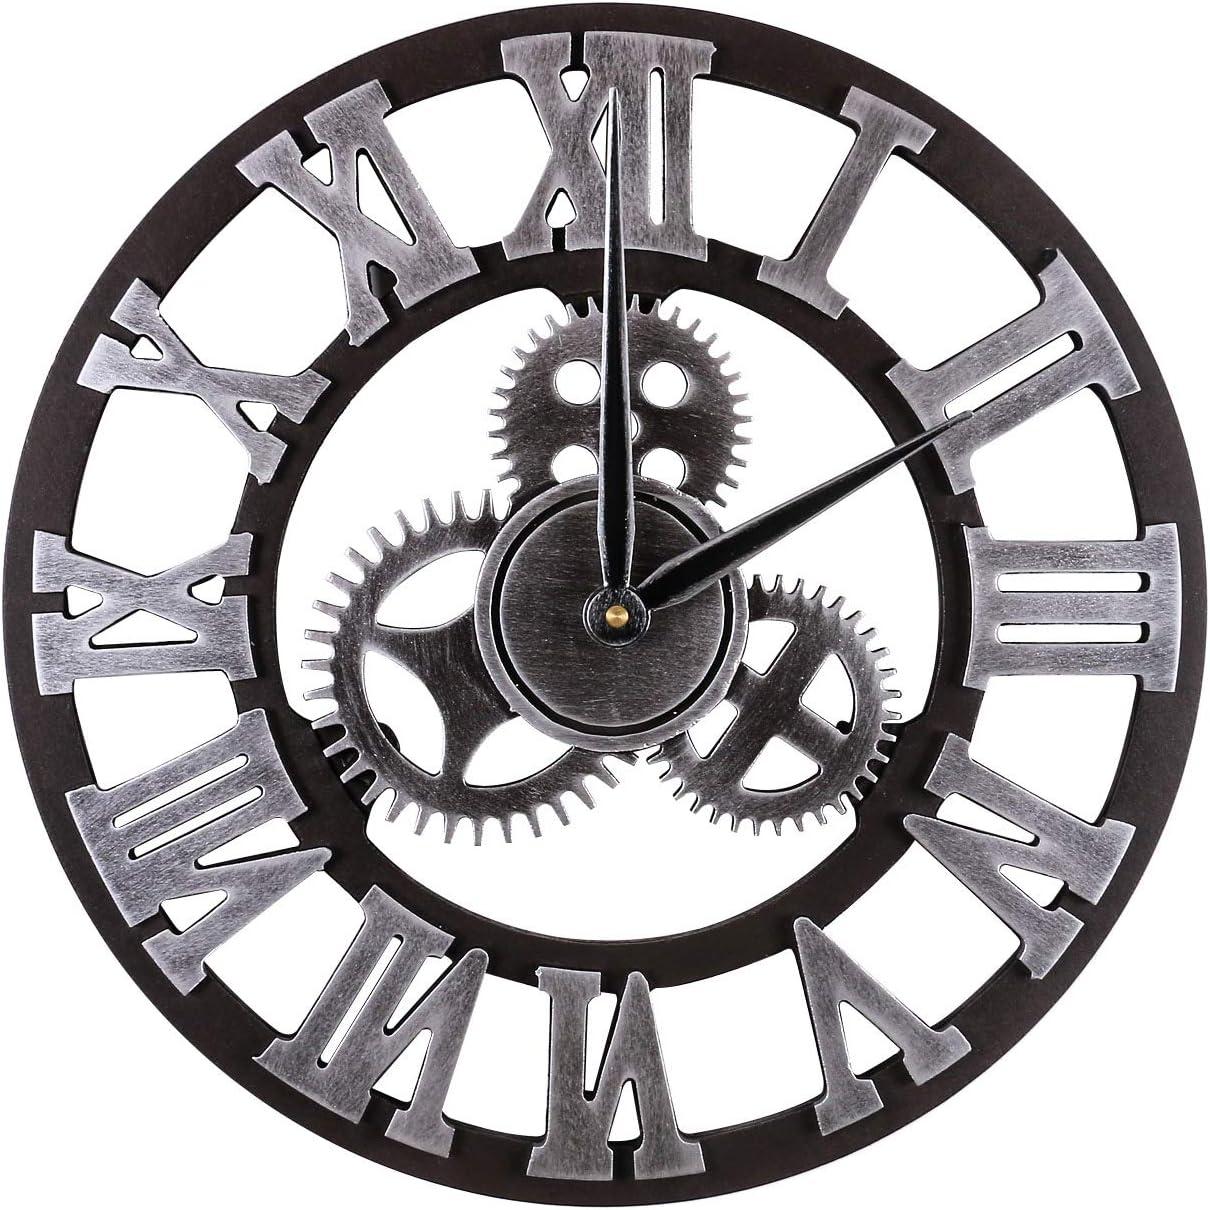 Mengshen Large Decorative Under blast sales Wall Clock Clo Retro Vintage European Same day shipping